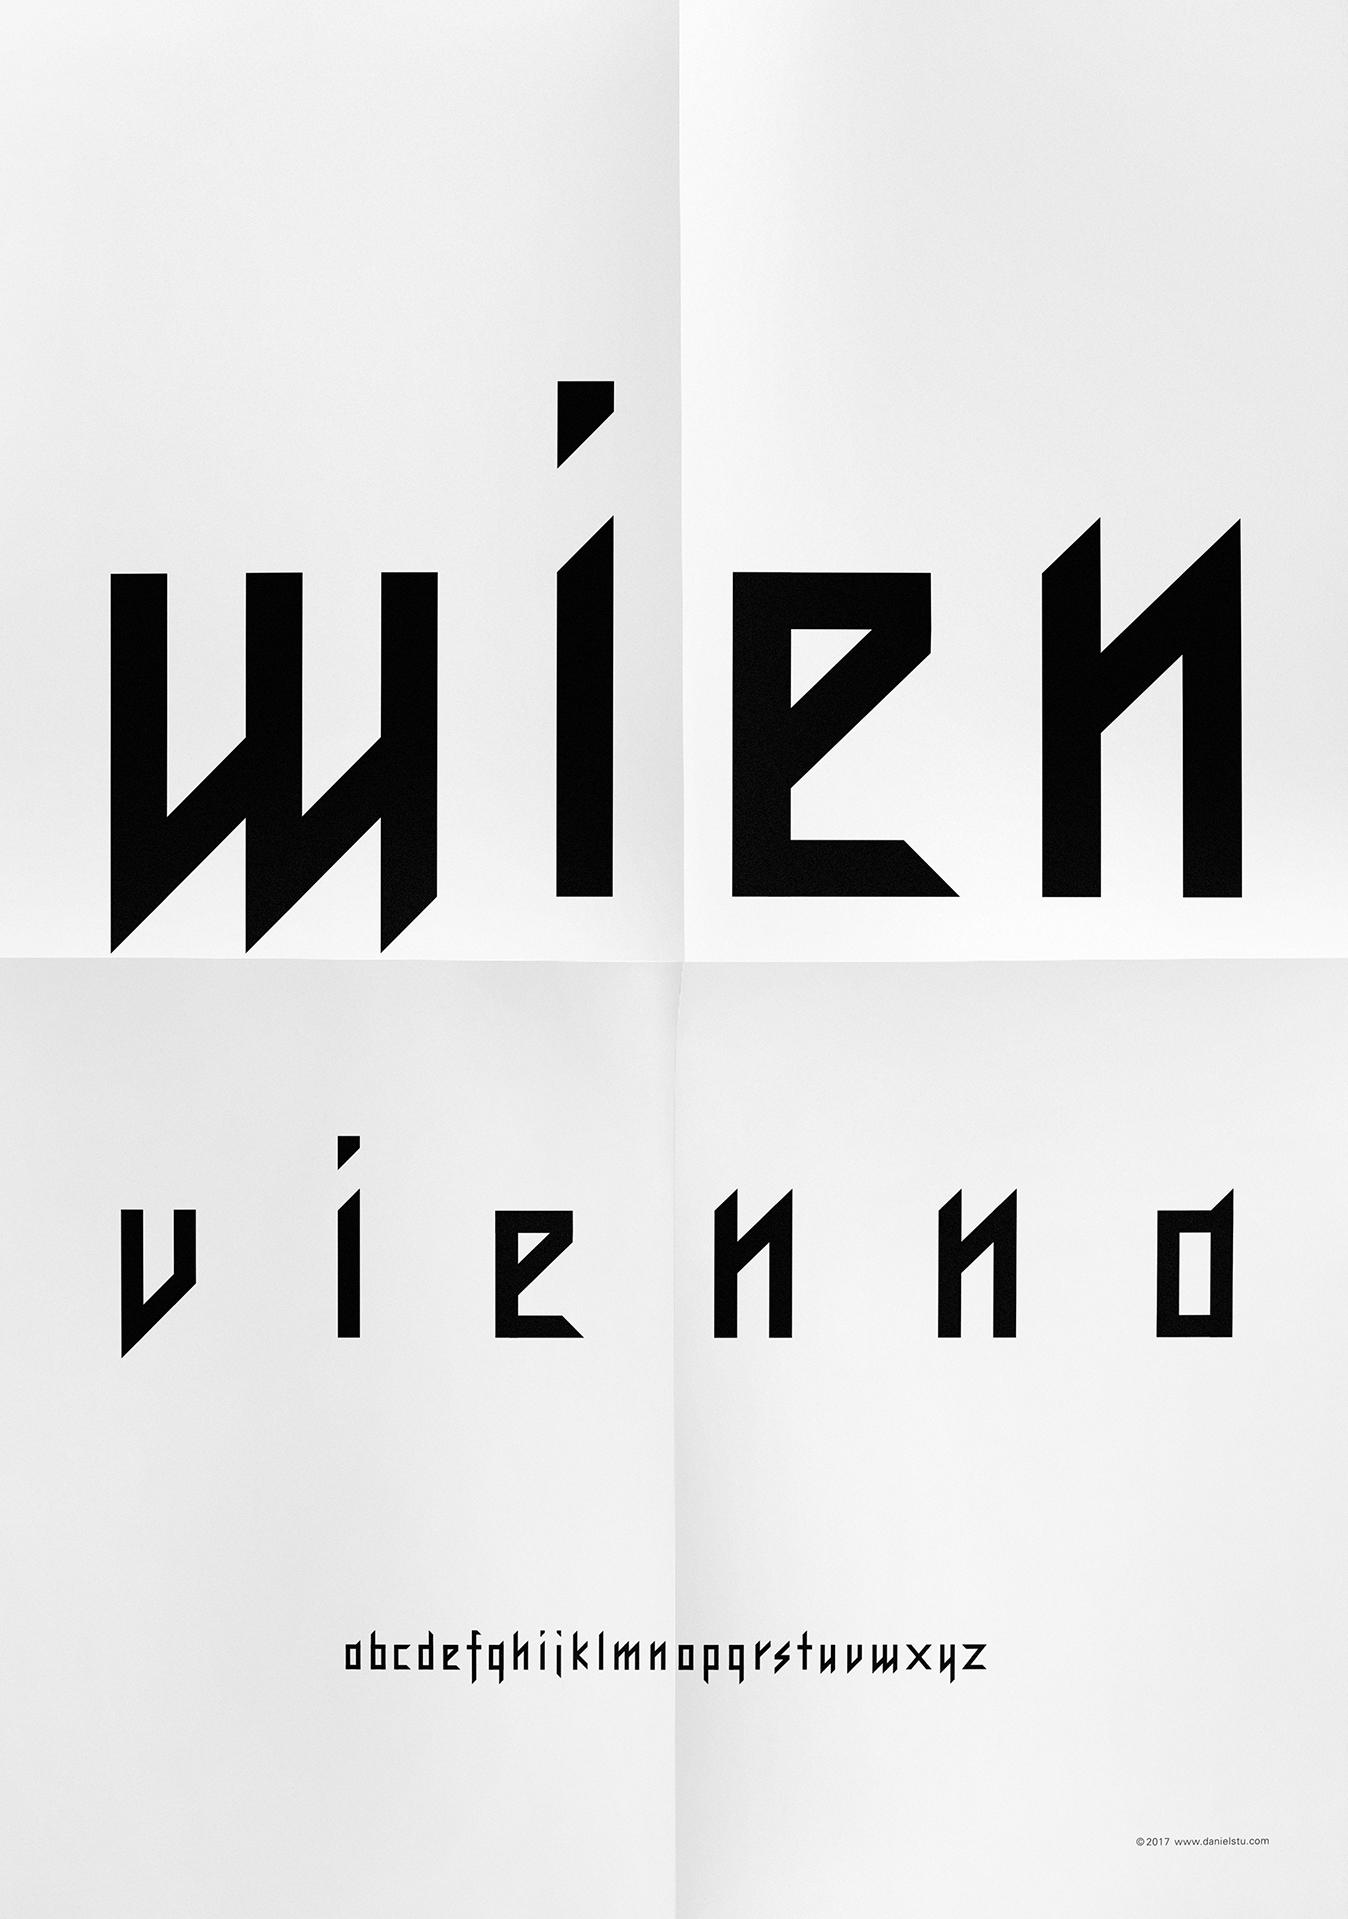 Daniel-Stuhlpfarrer_Visual-Communication_Graphic-Design_Poster_Wiener-Theater-Vienna-3